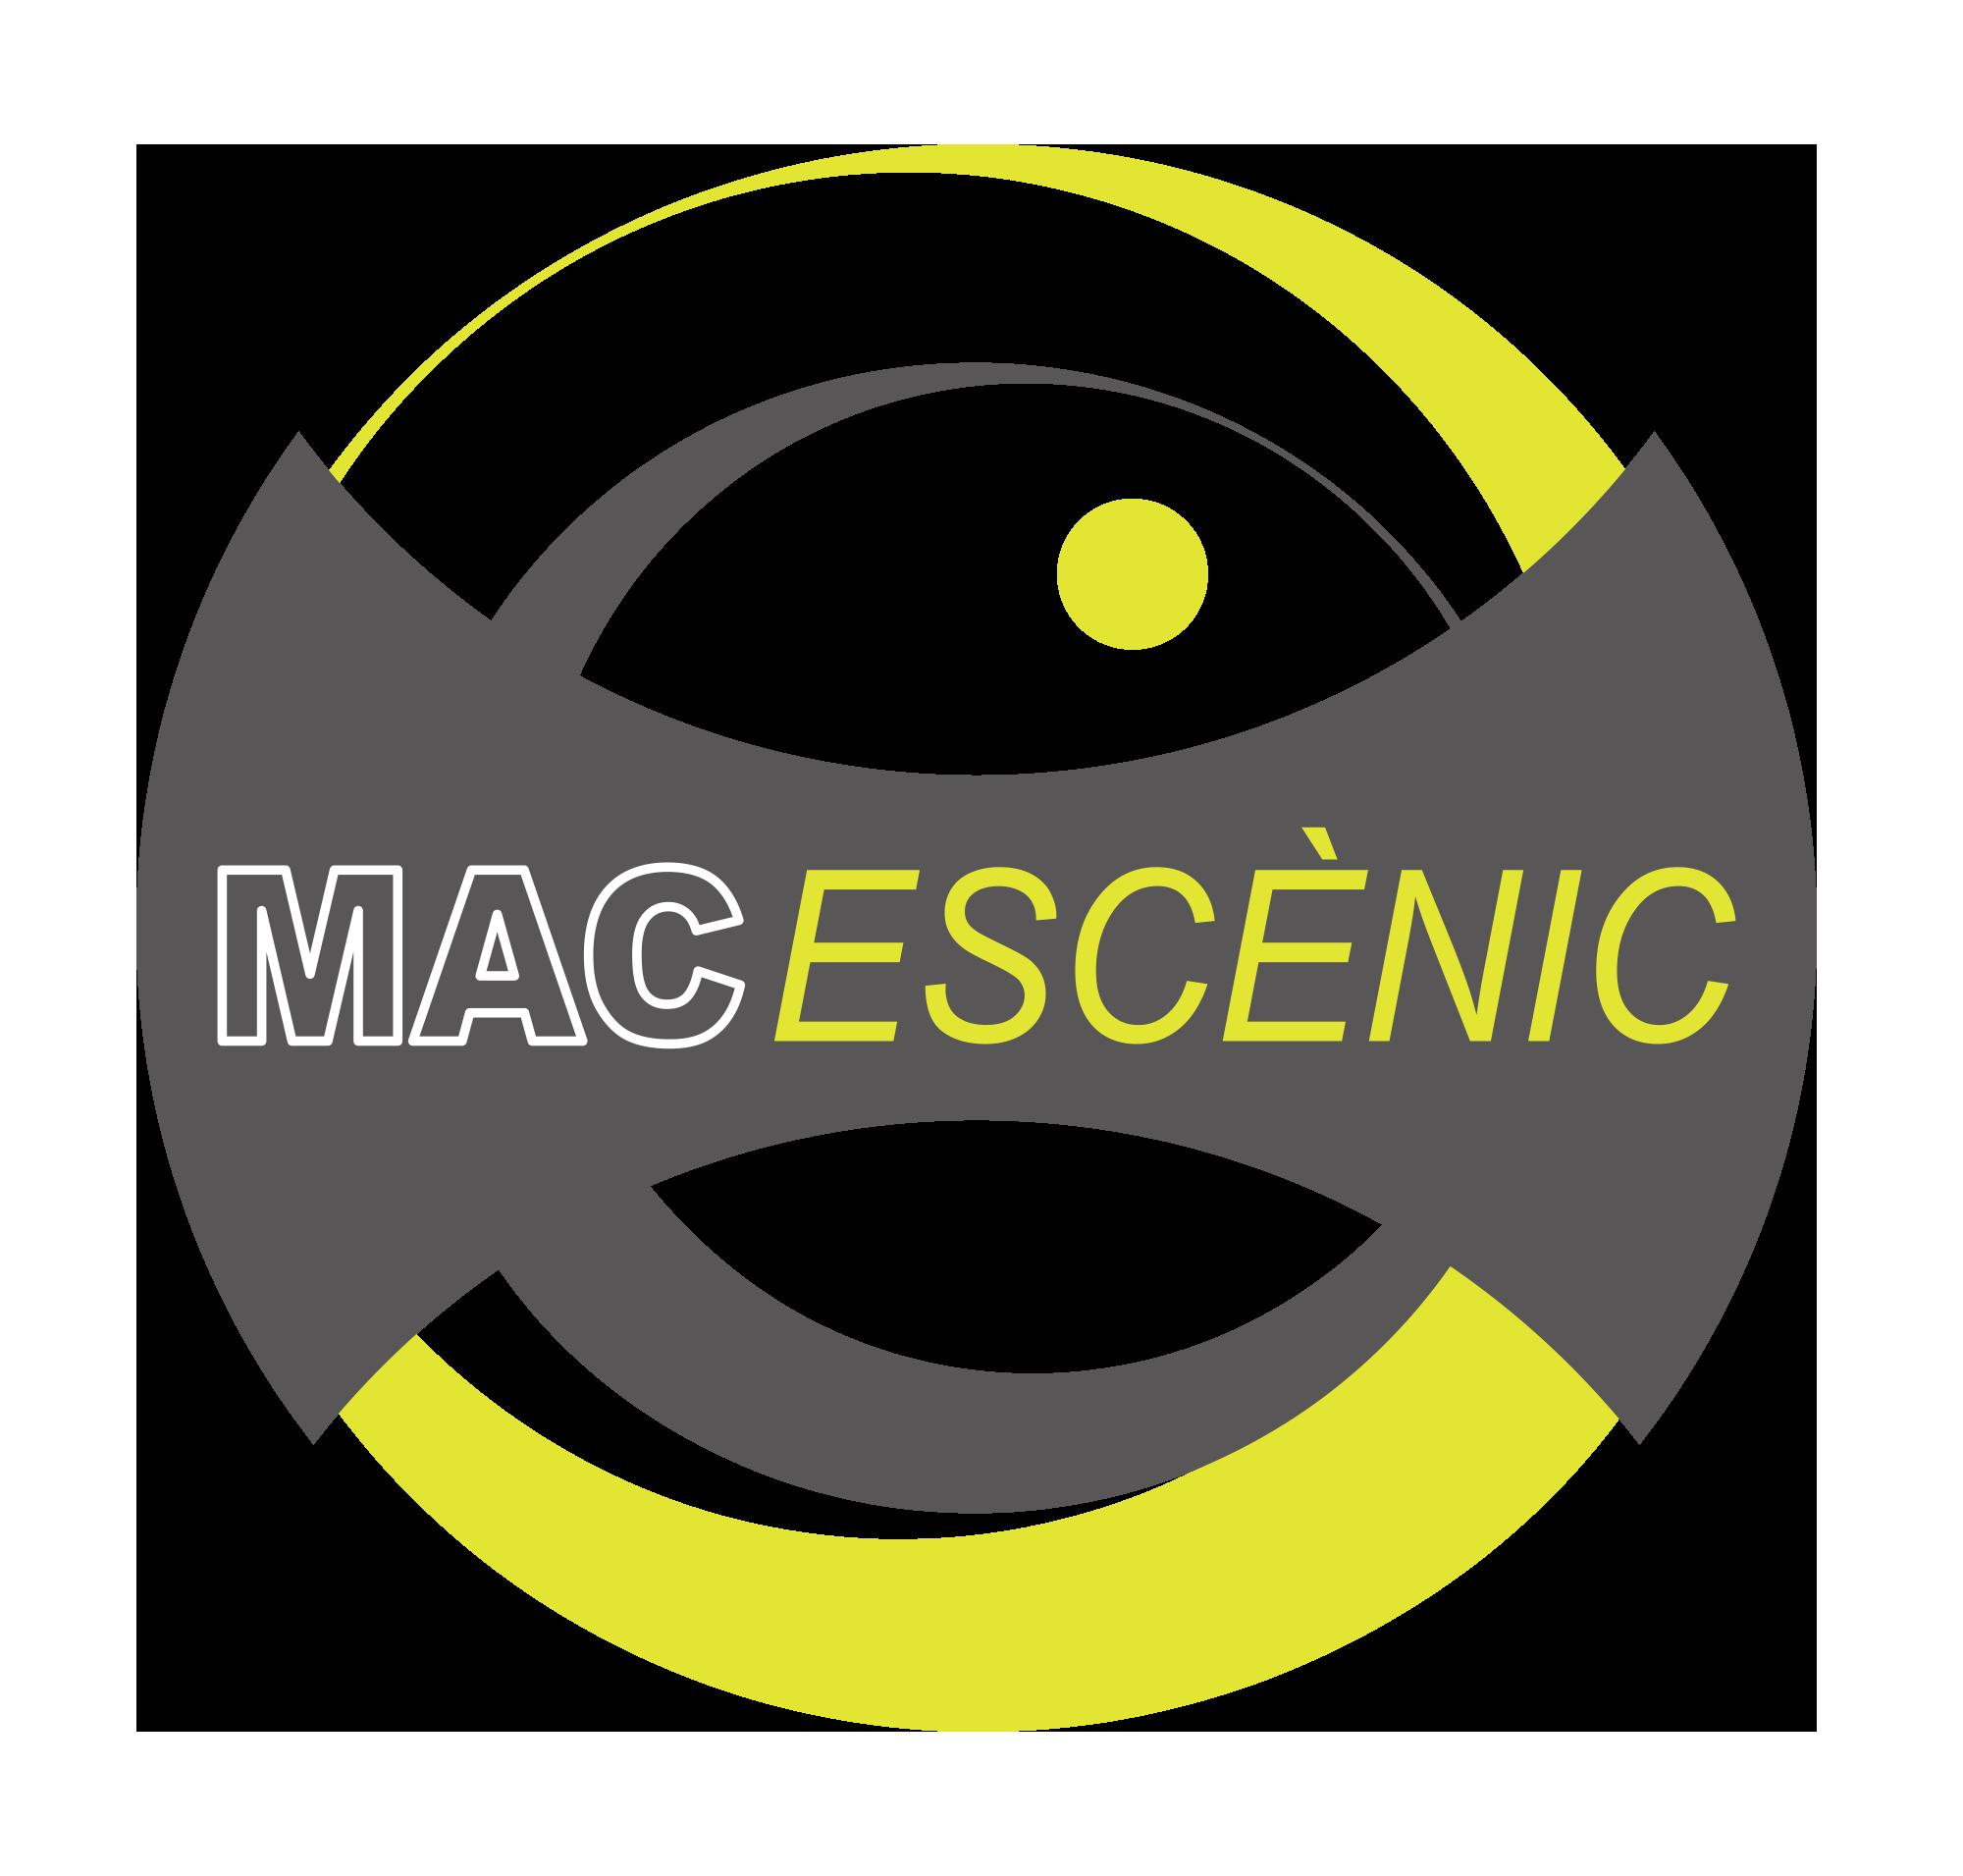 Macescenic